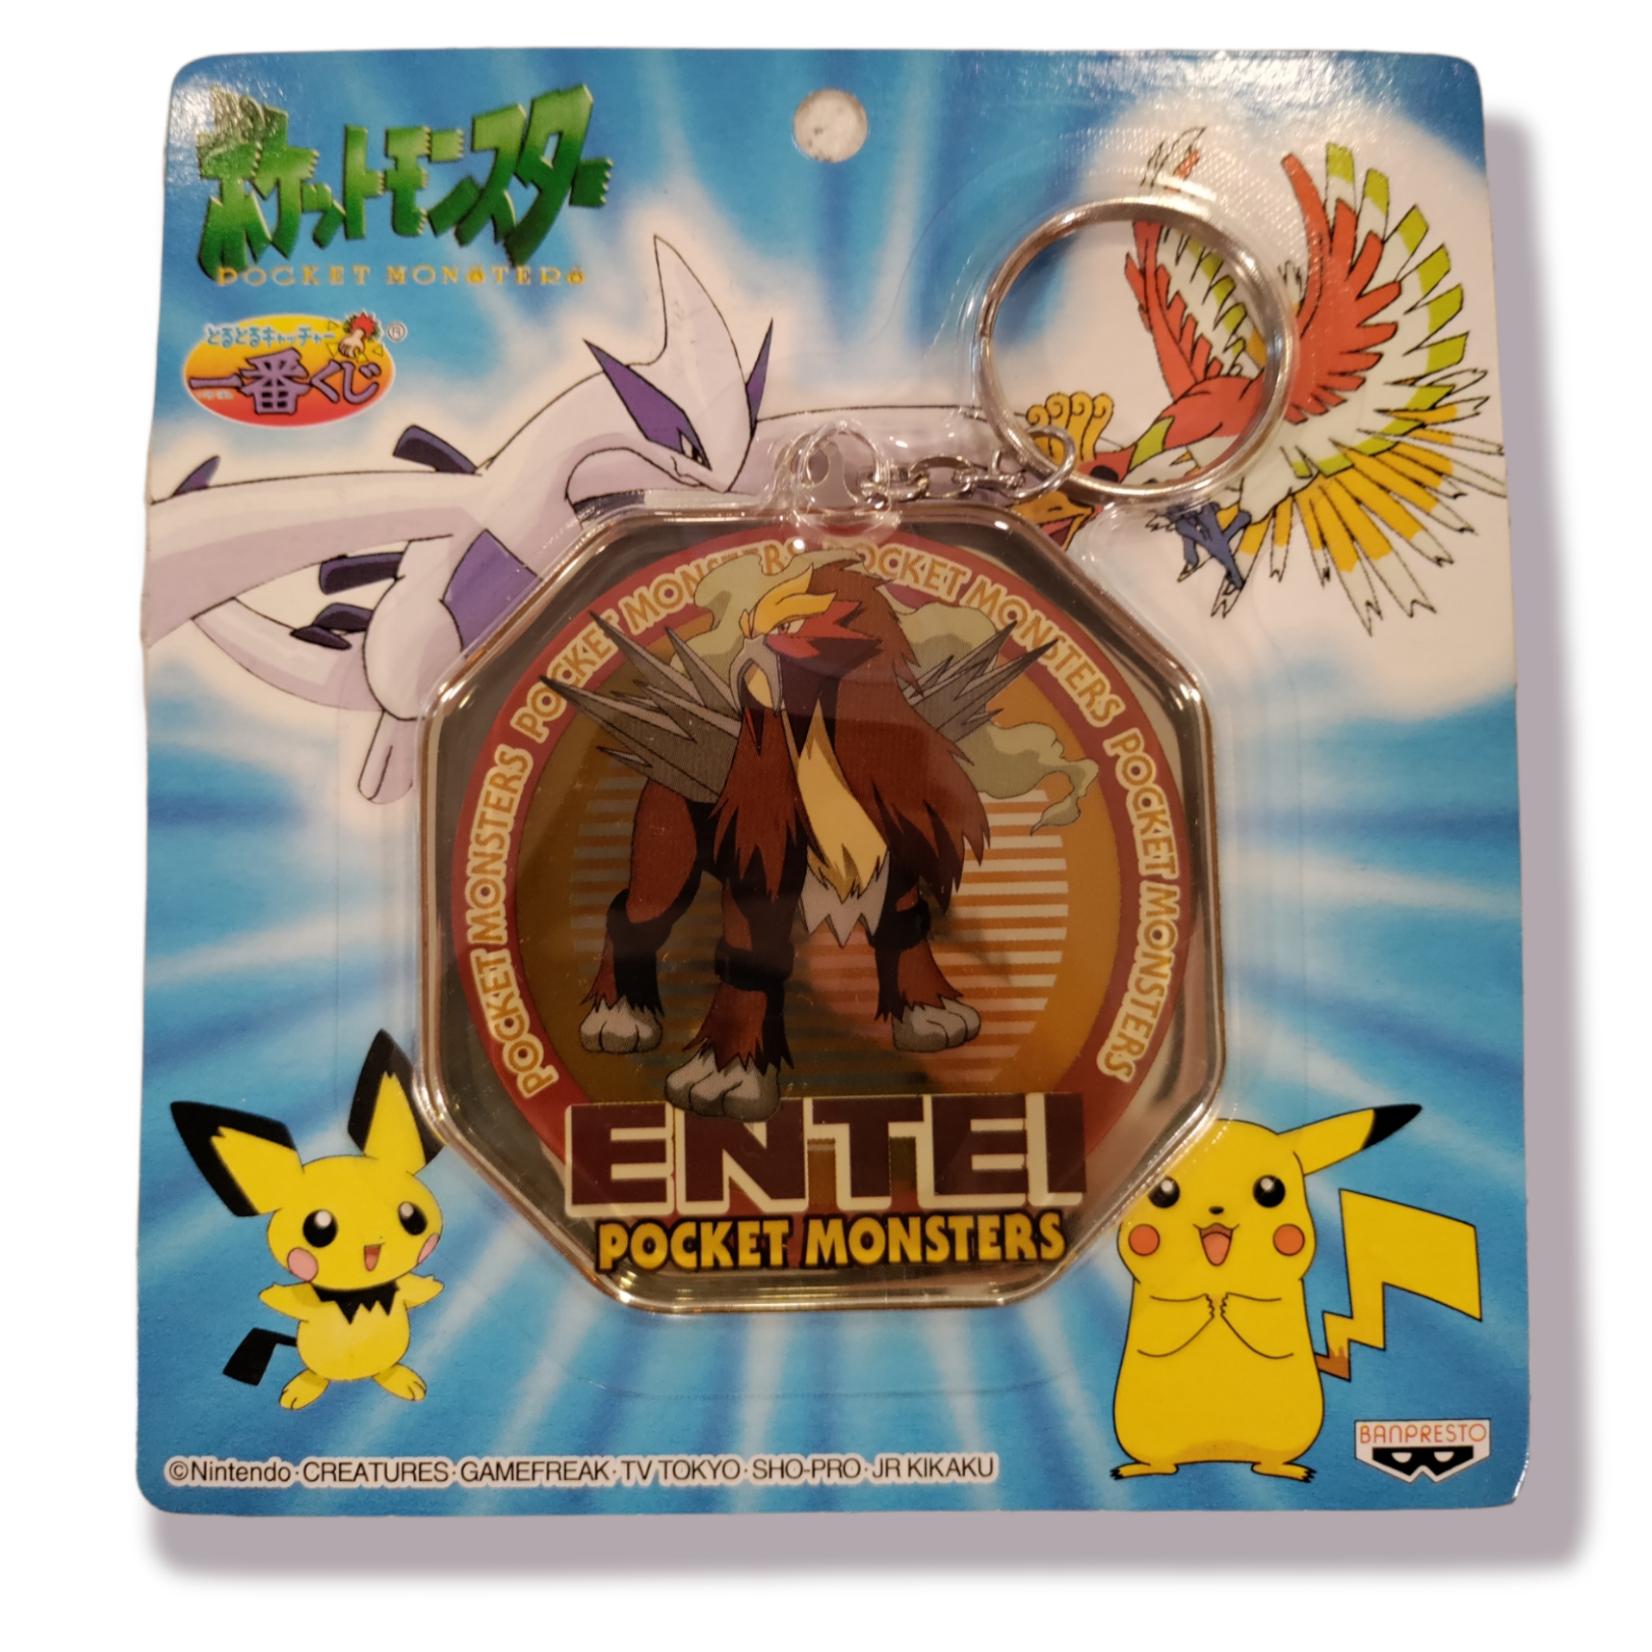 shopro Keychain Pocket Monsters Entei